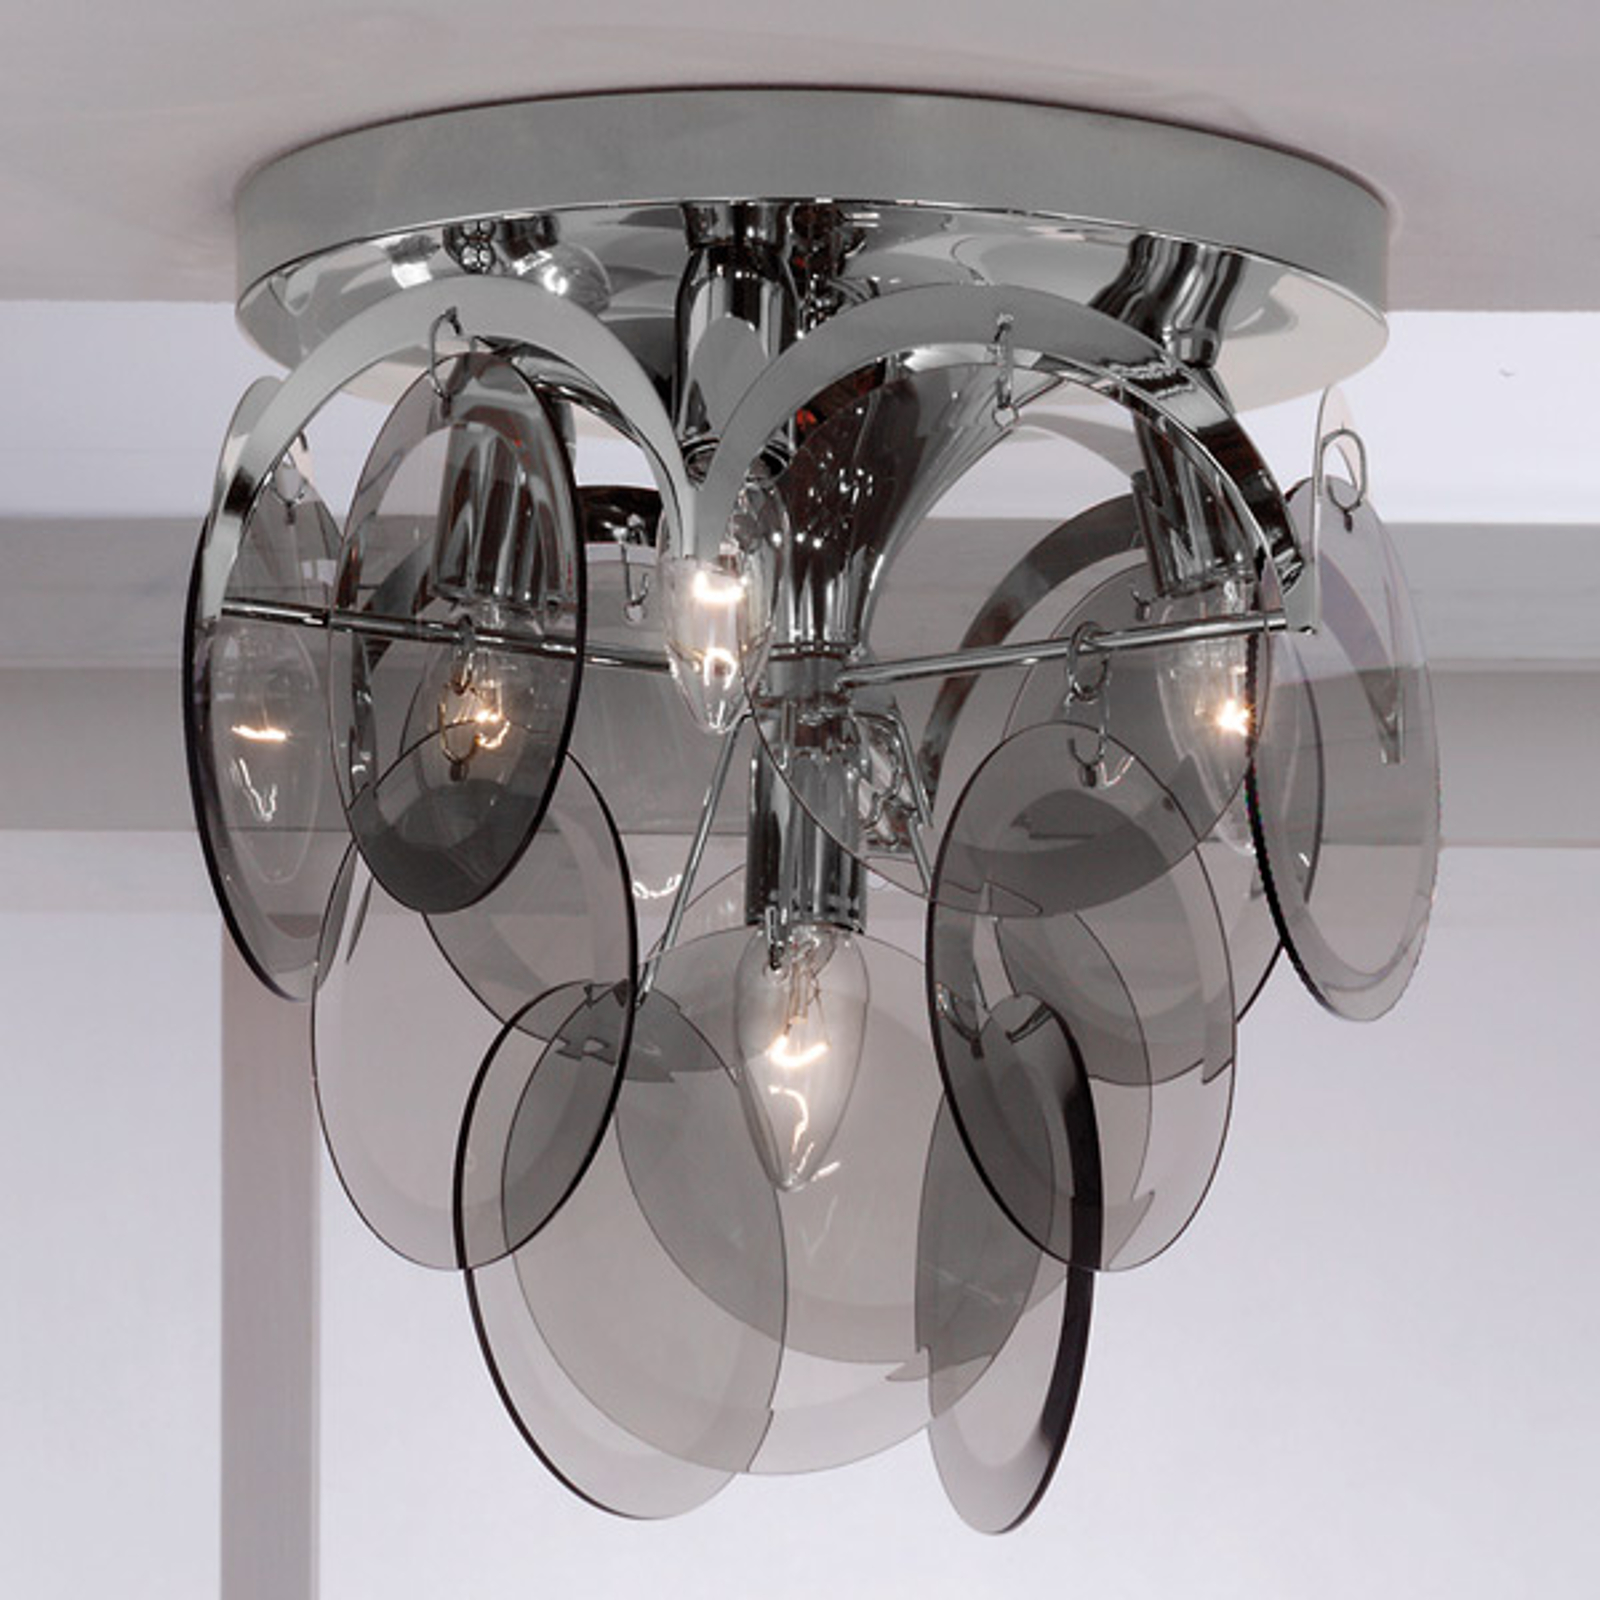 Røykfarget dekorbeheng - taklampe Carolo, 4 lys